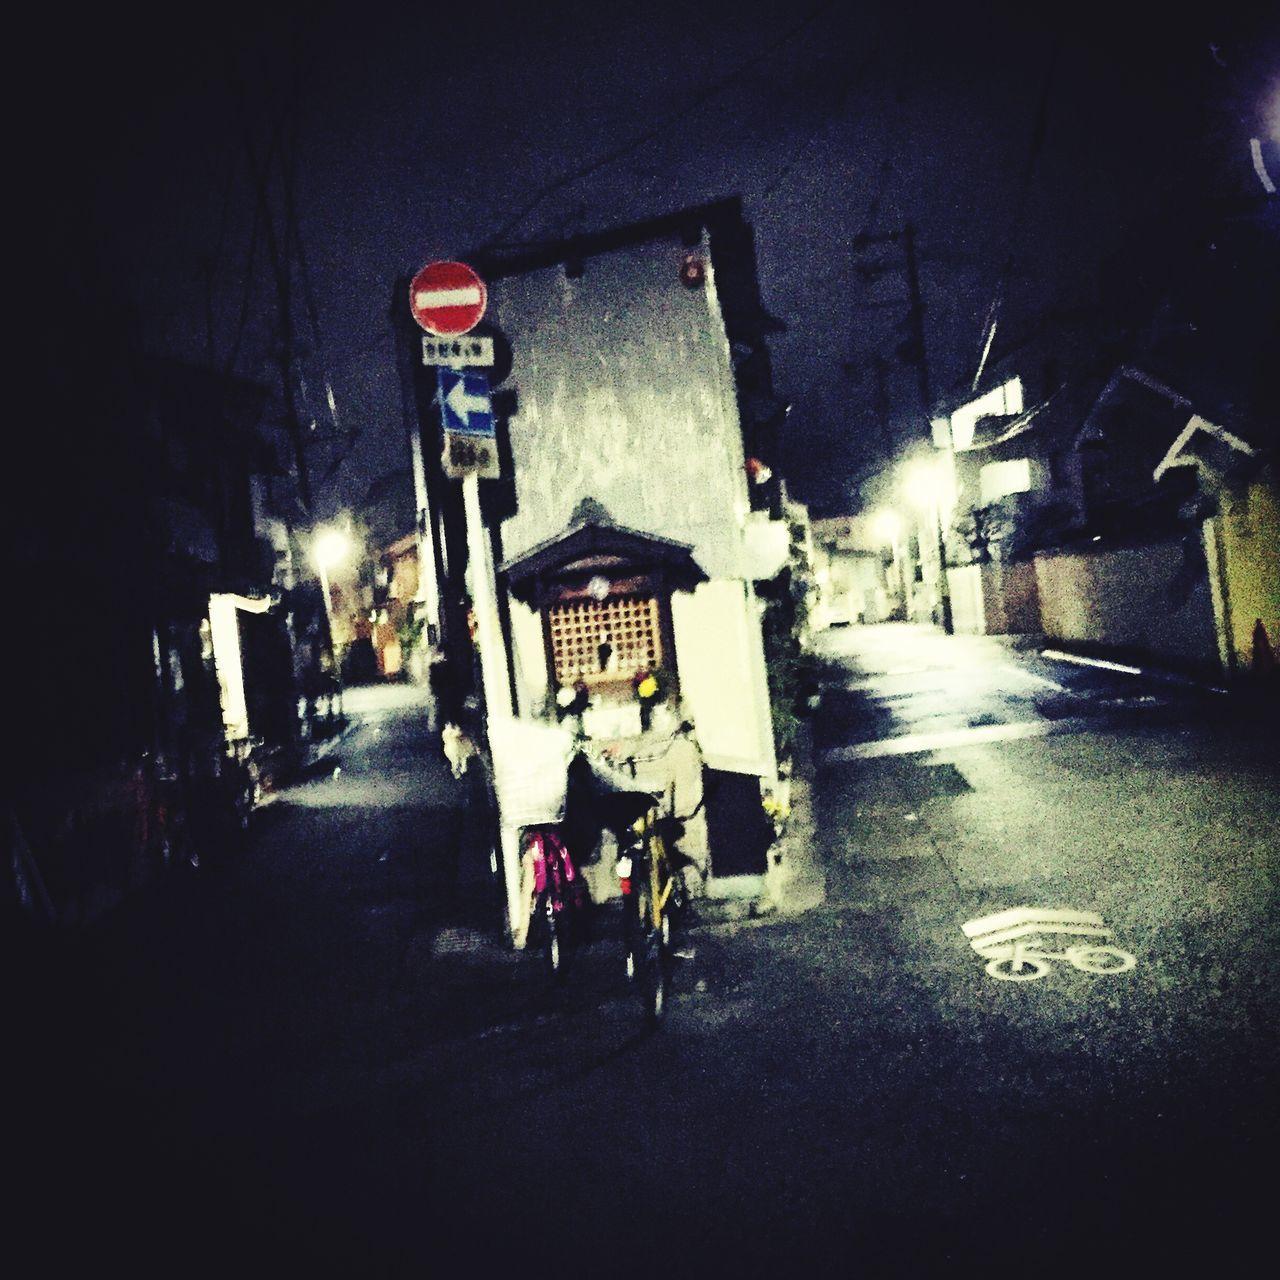 Kyoto Kyoto,japan Kyoto, Japan Kyotojapan Kyoto Japan Kyotowalk Kyoto Street Kyoto NIght Lights